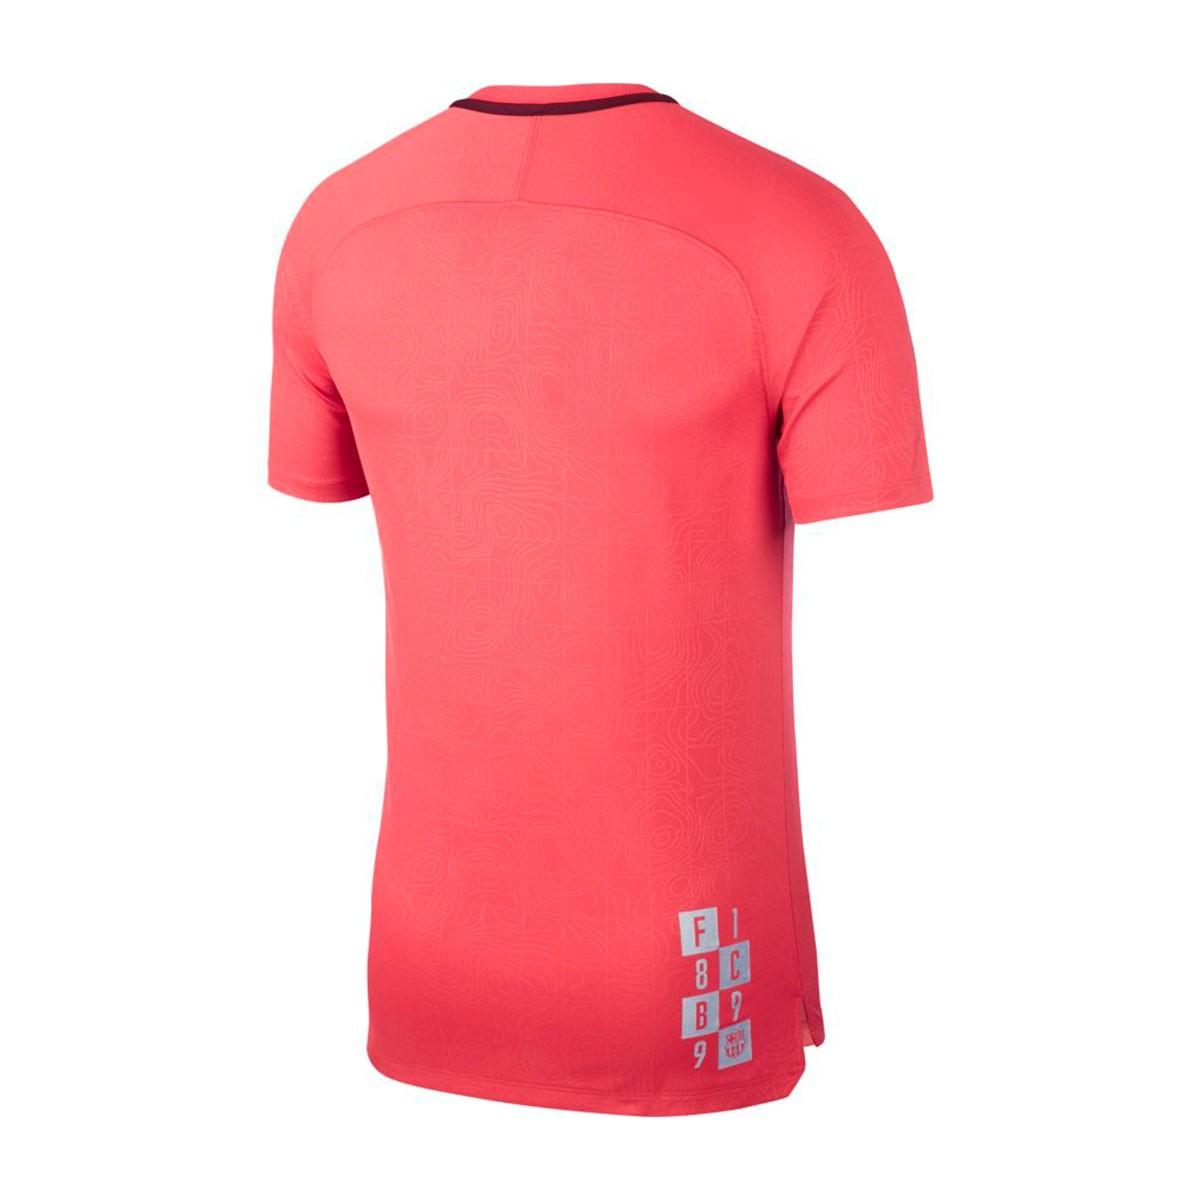 7bfc22d71fb Nike Dry FC Barcelona Squad 2018-2019 Jersey. Tropical pink-Deep ...